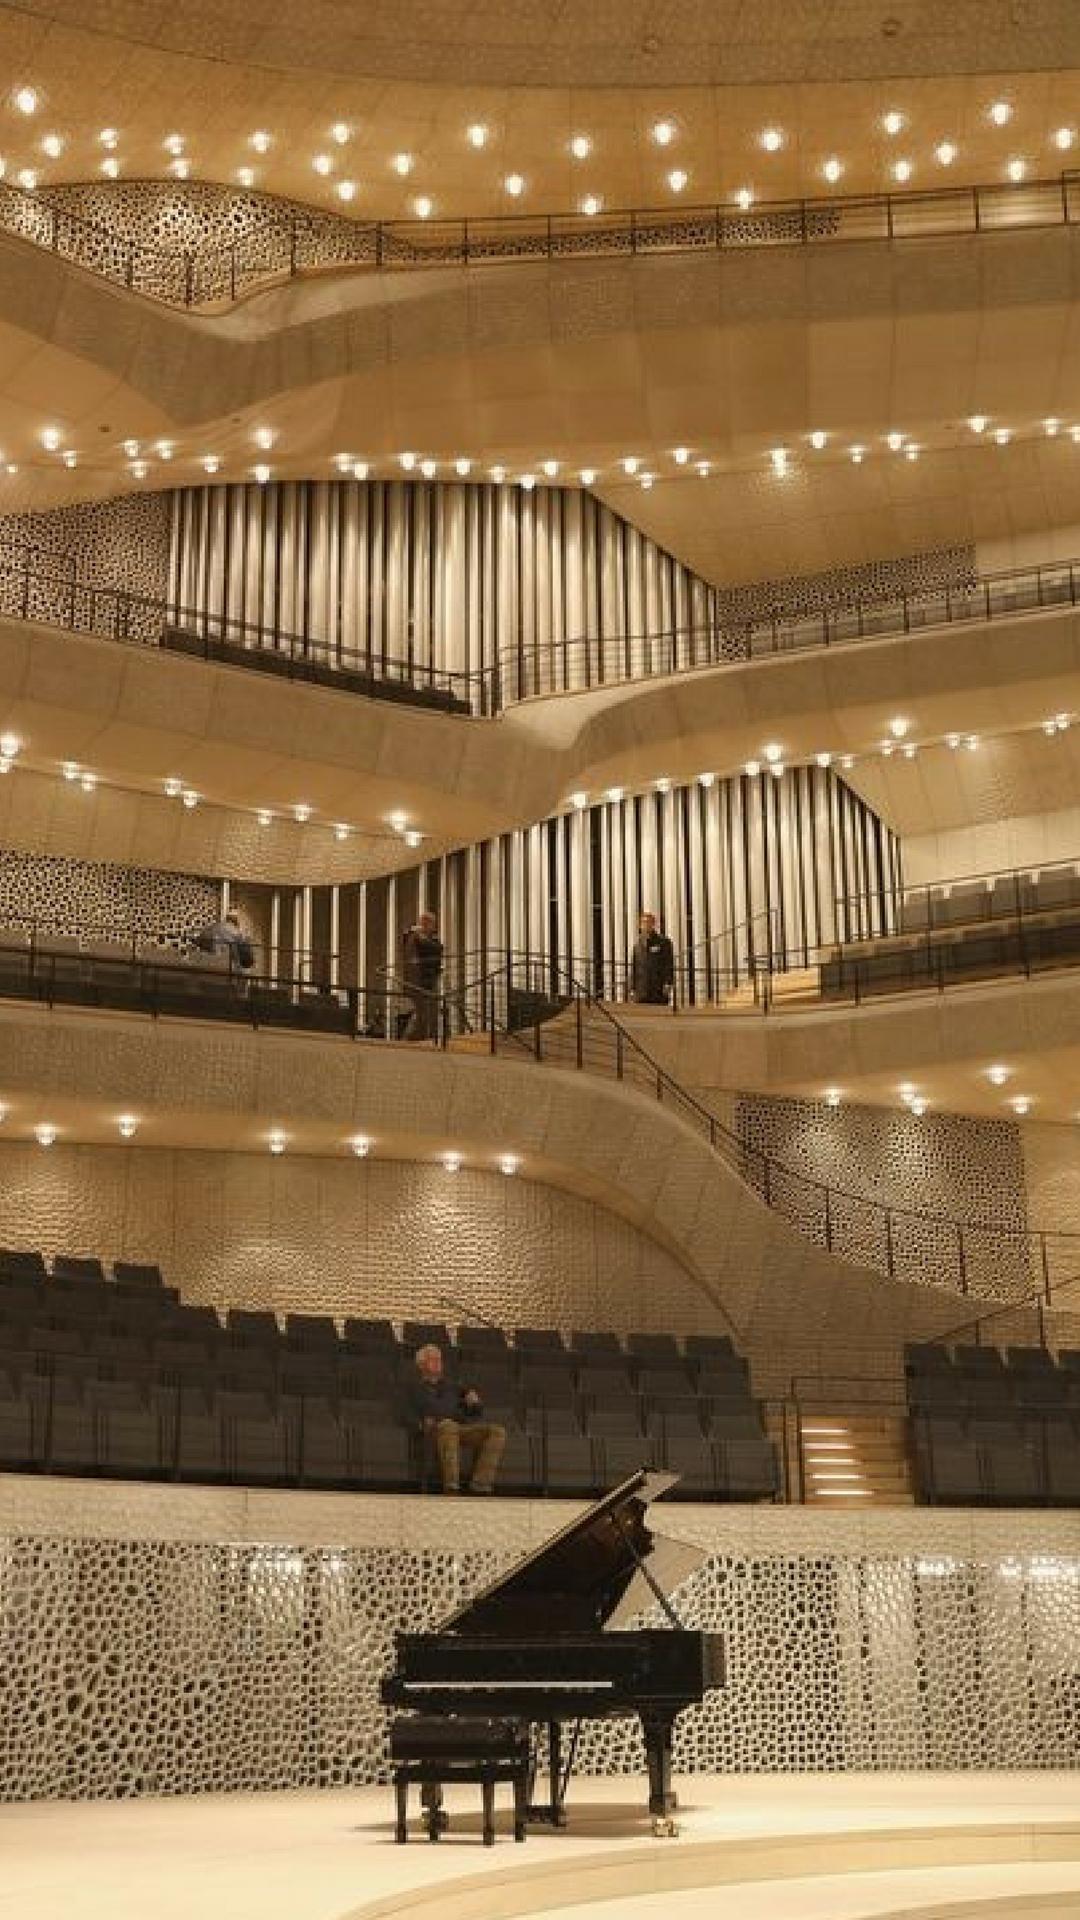 The Interior Of The Elphilharmonie Concert Hall